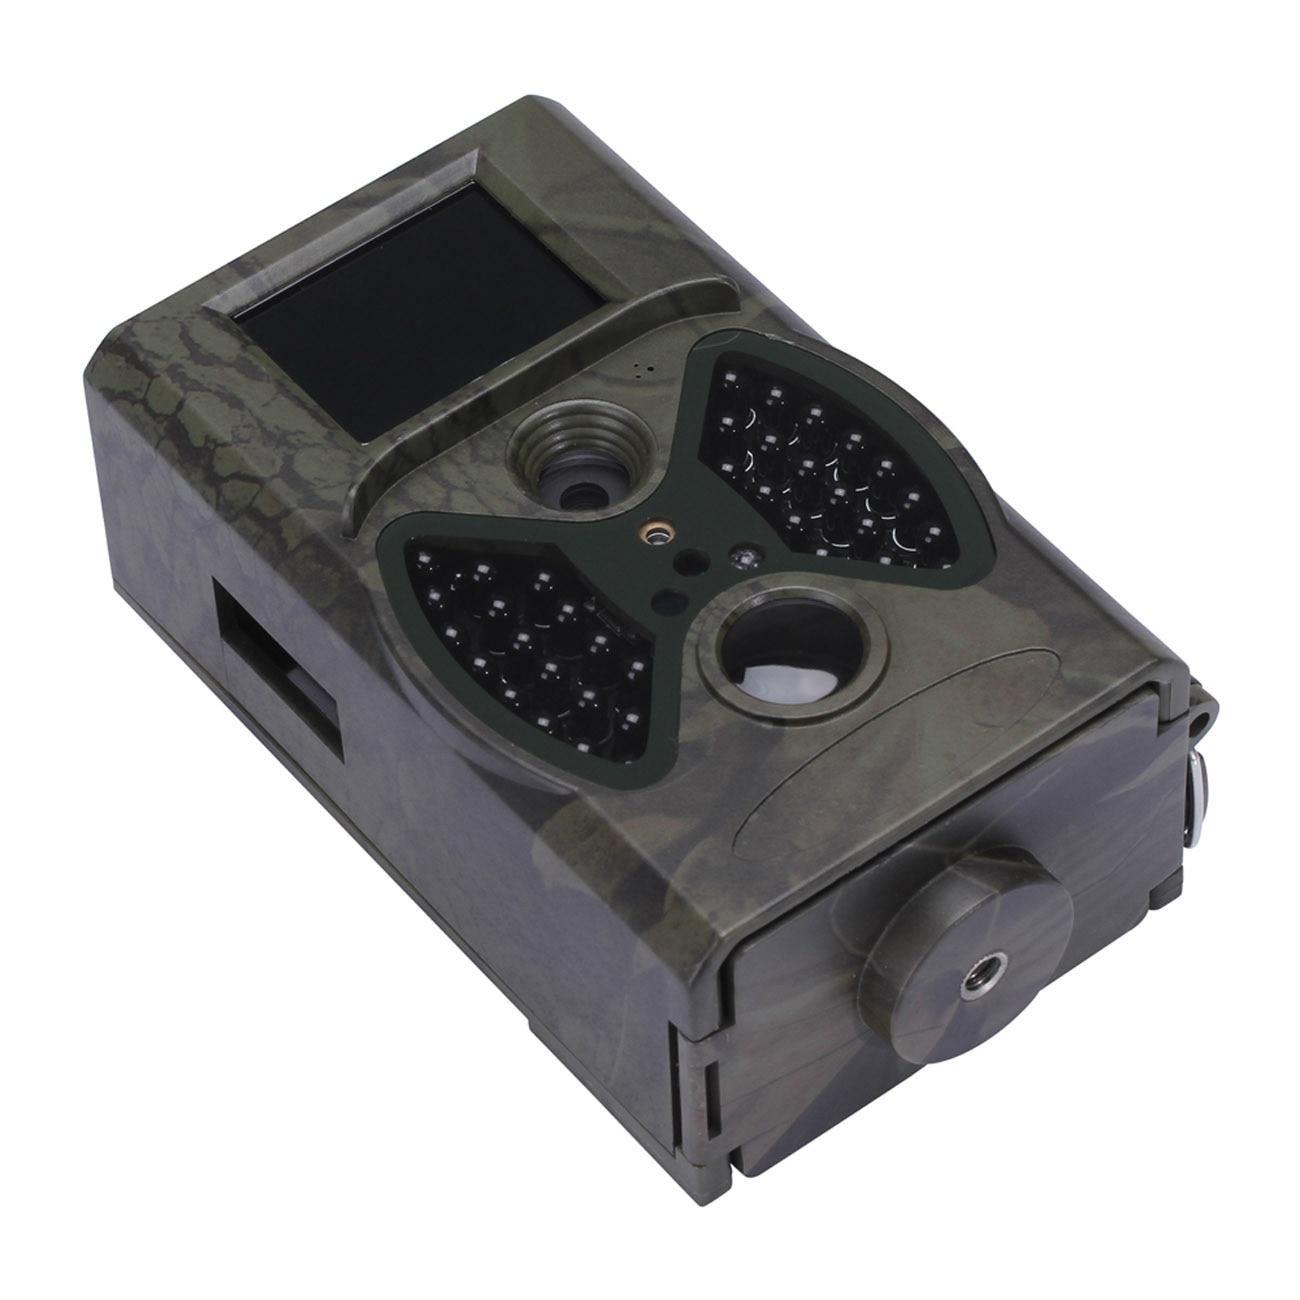 Hunting Trail Camera HC300A 16MP Night Vision 1080P Video Wildlife Camera Cams for Hunter Photos Trap Surveillance